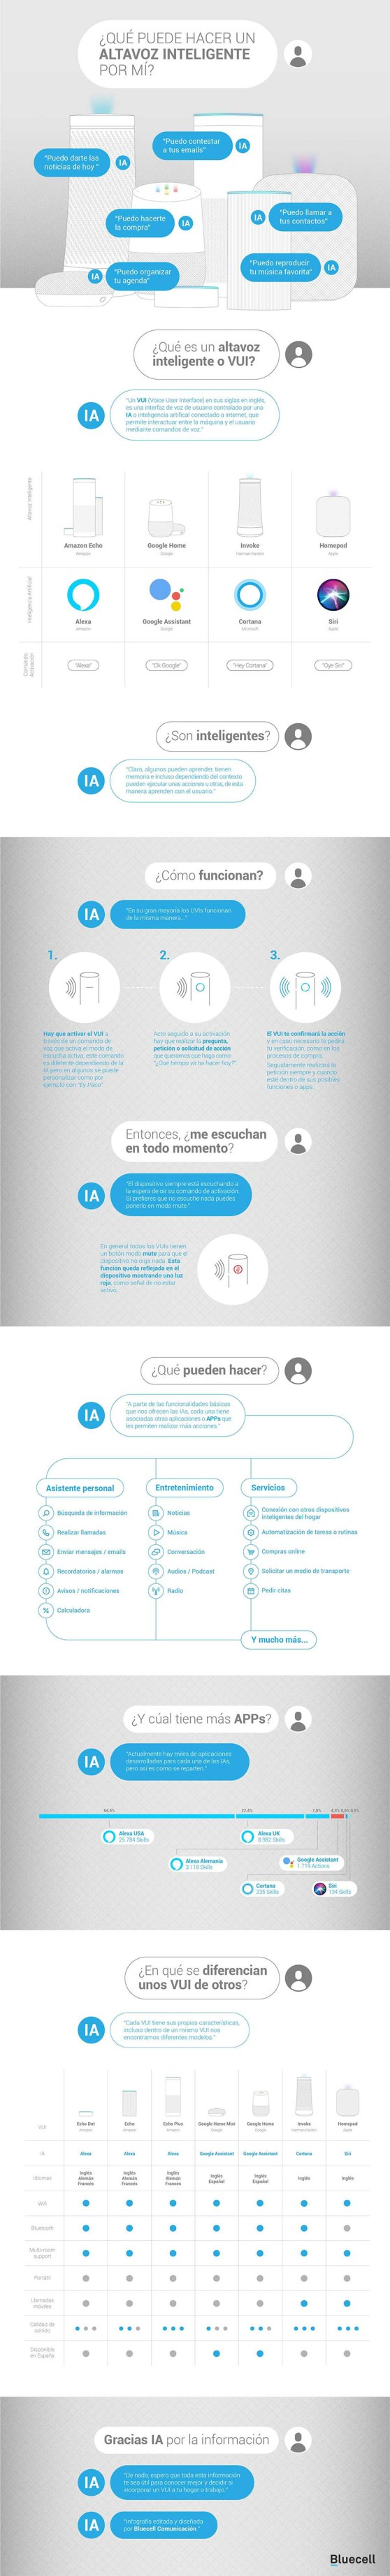 infografia_bluecell_altavoz-inteligente